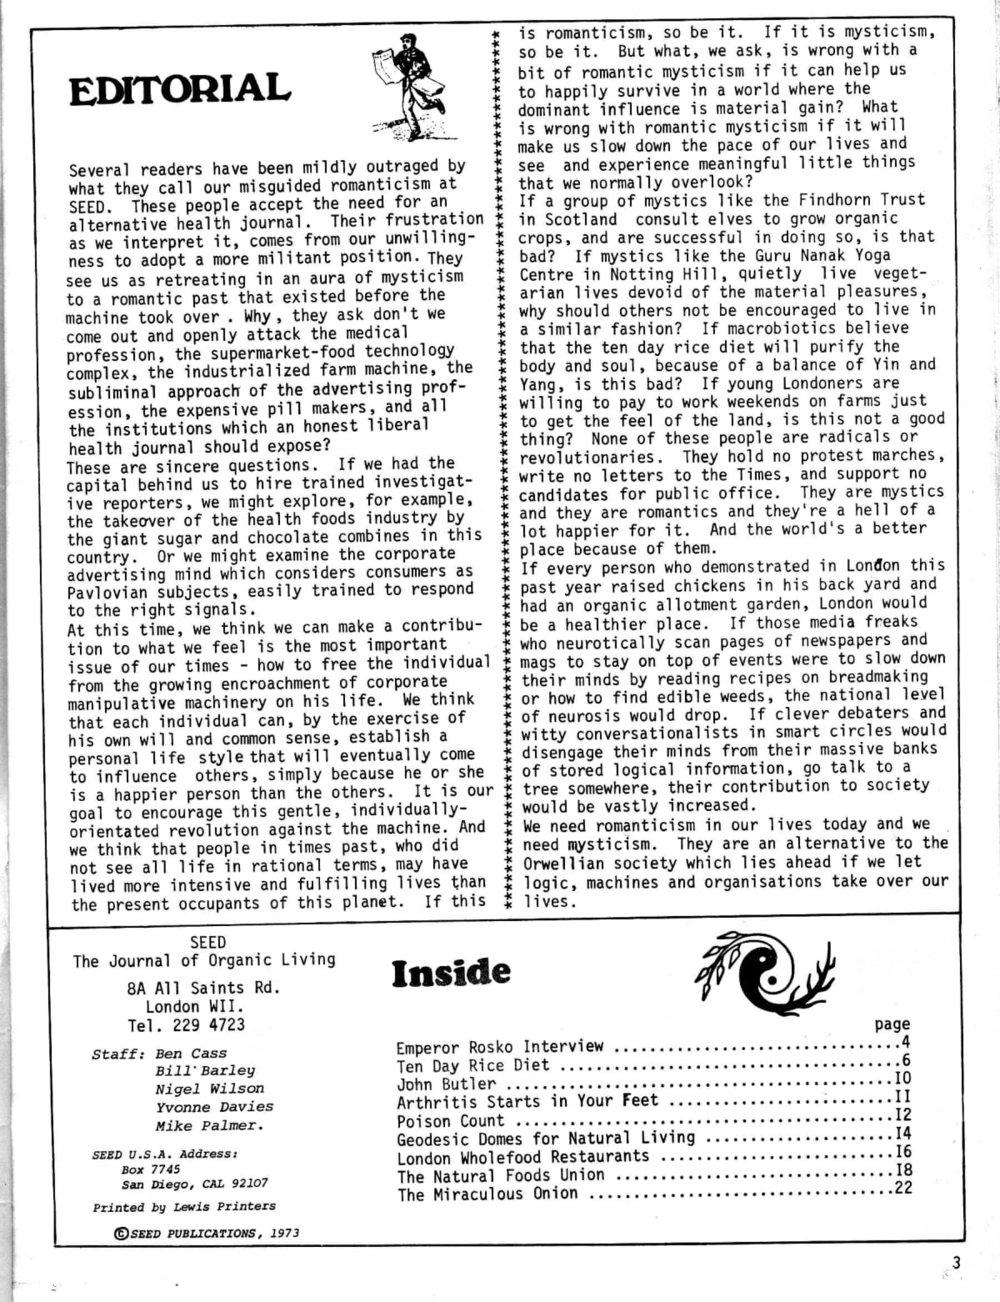 seed-v2-n5-may1973-03.jpg